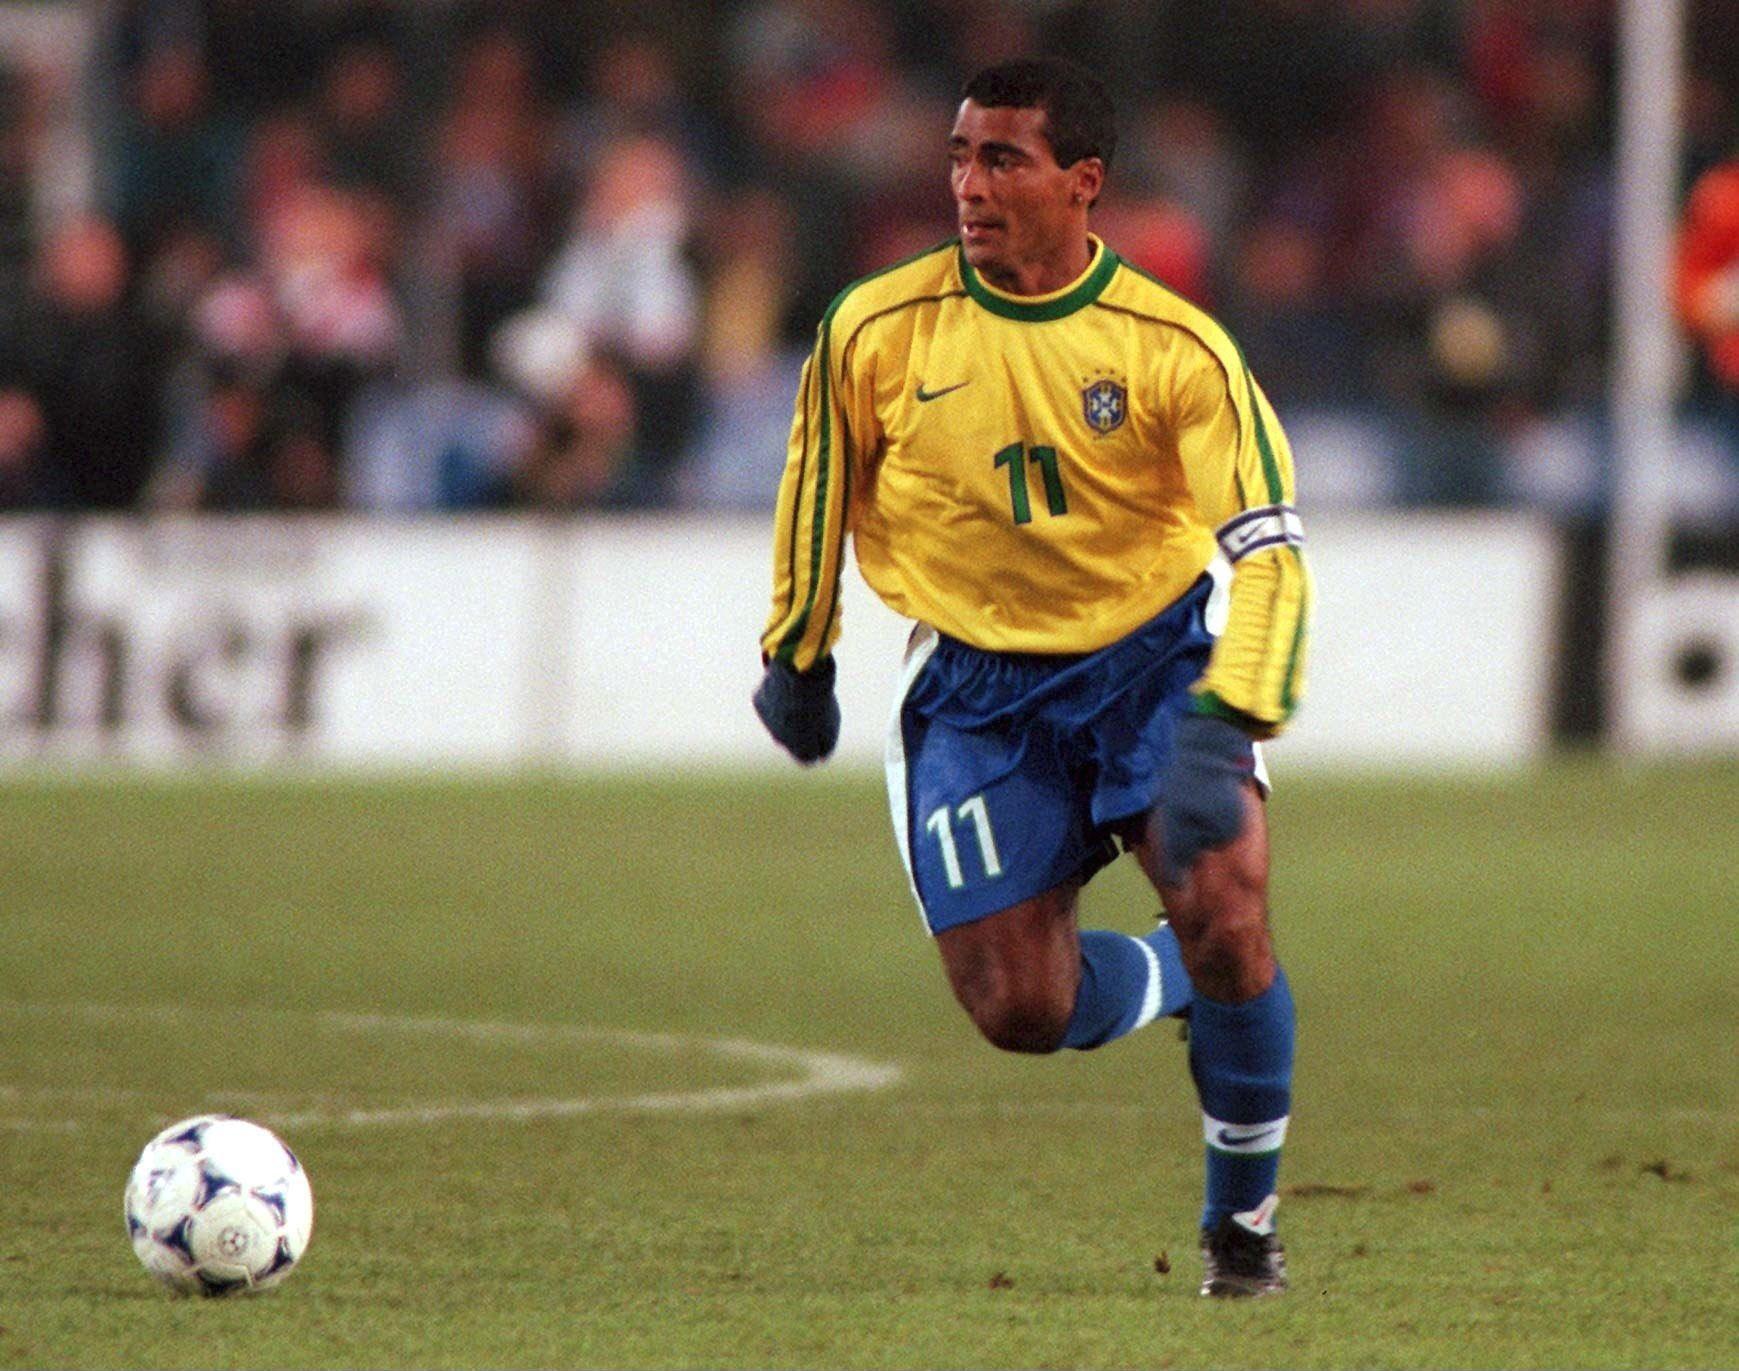 Legends of world football - Romario